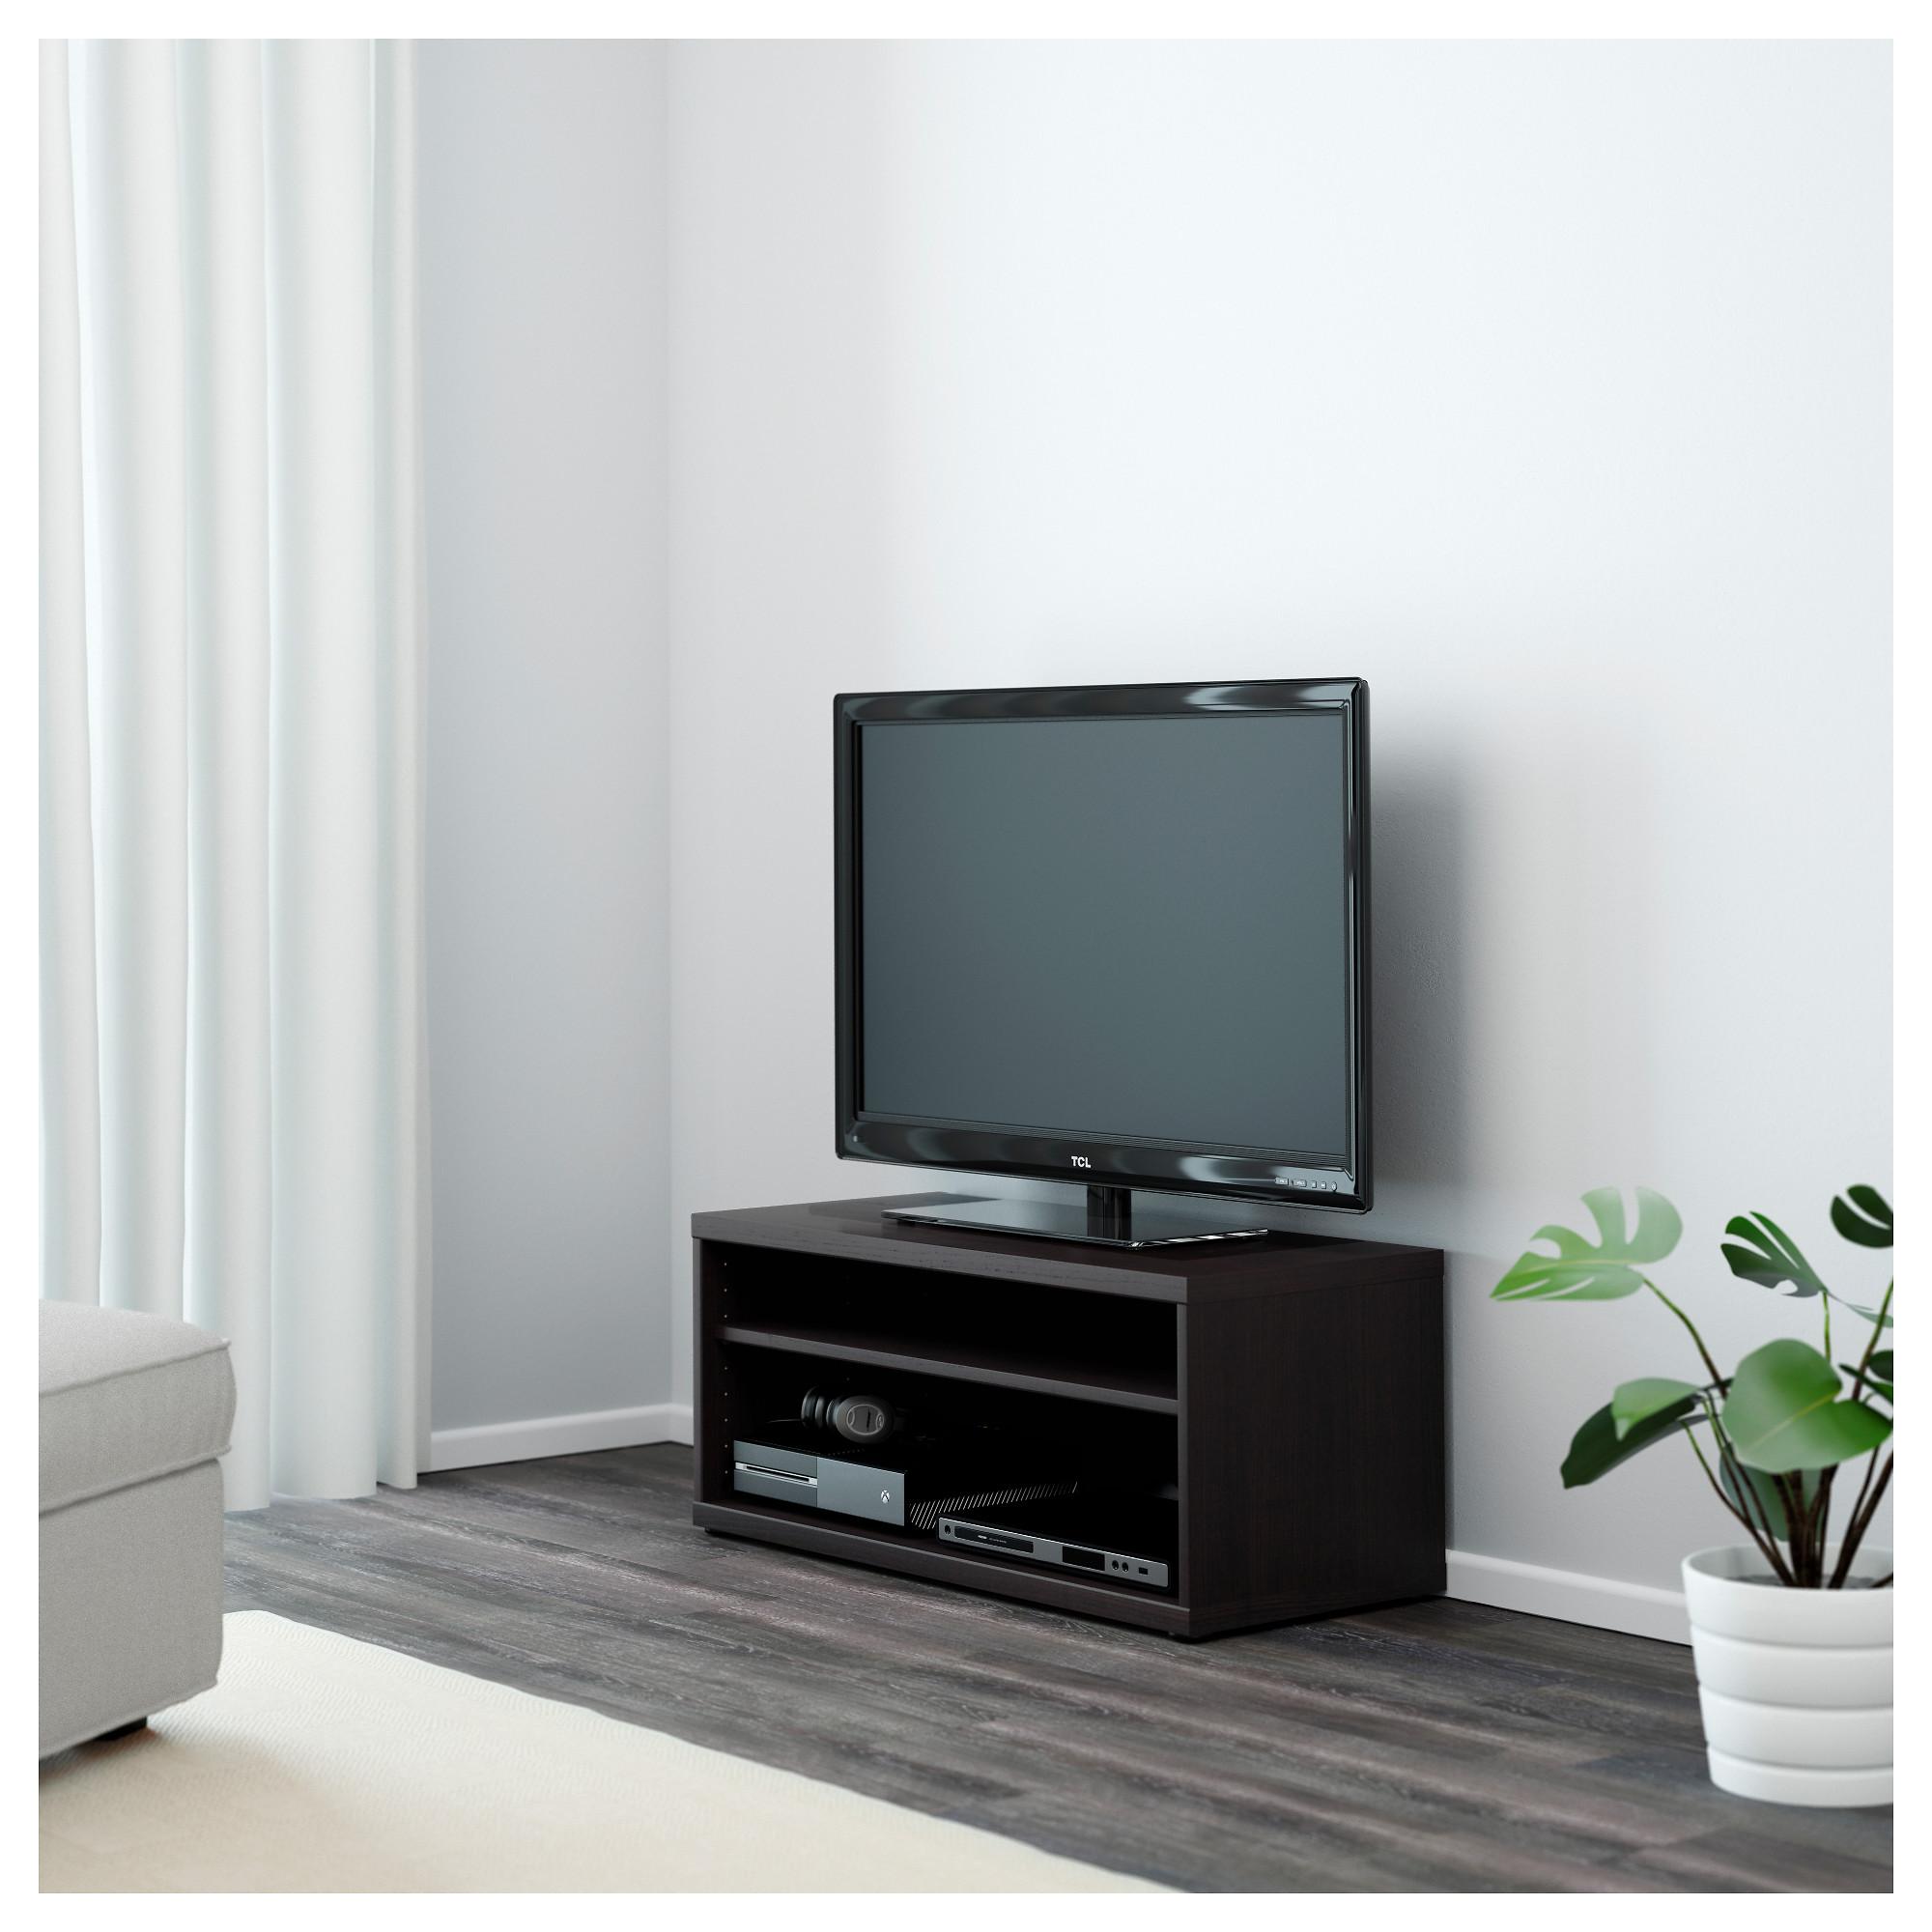 Awesome Mosjo Tv Bench Black Brown Ikea Hong Kong Evergreenethics Interior Chair Design Evergreenethicsorg